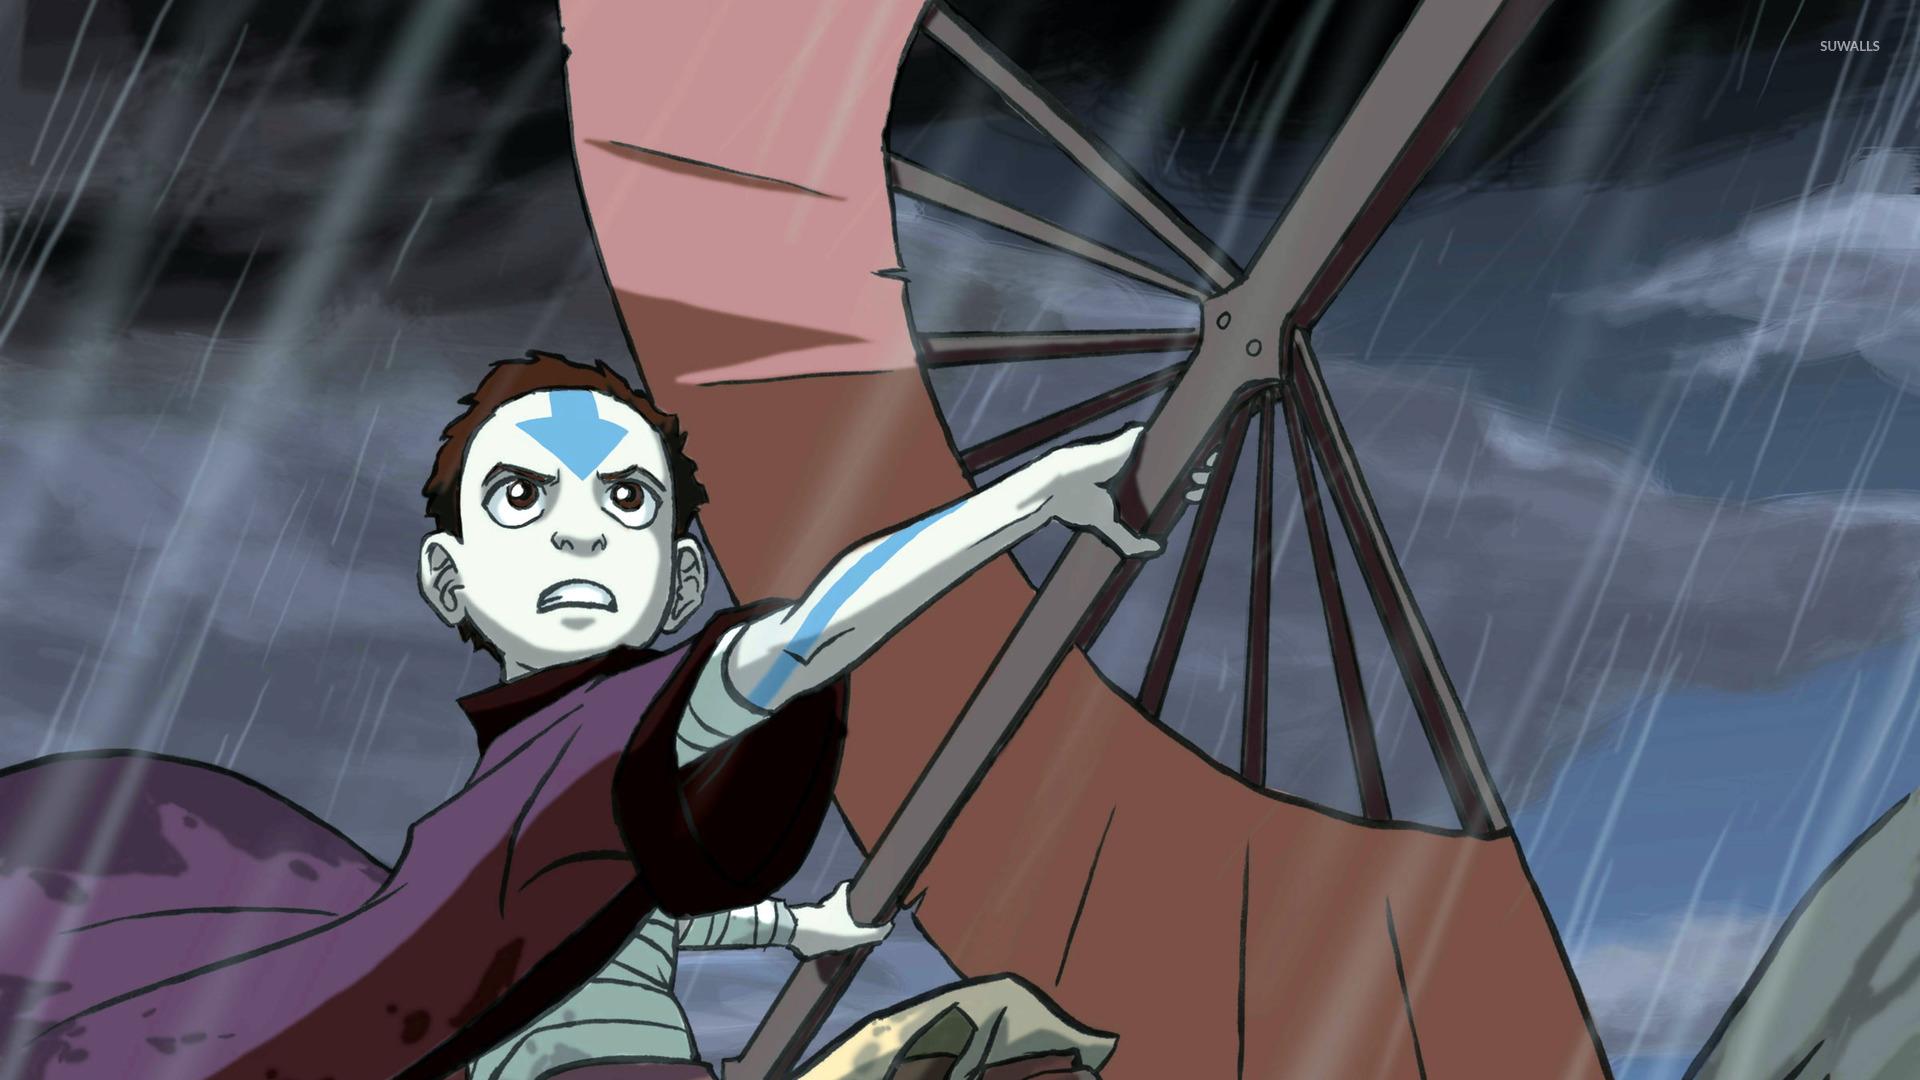 Aang - Avatar: The Last Airbender [3] wallpaper - Anime ...